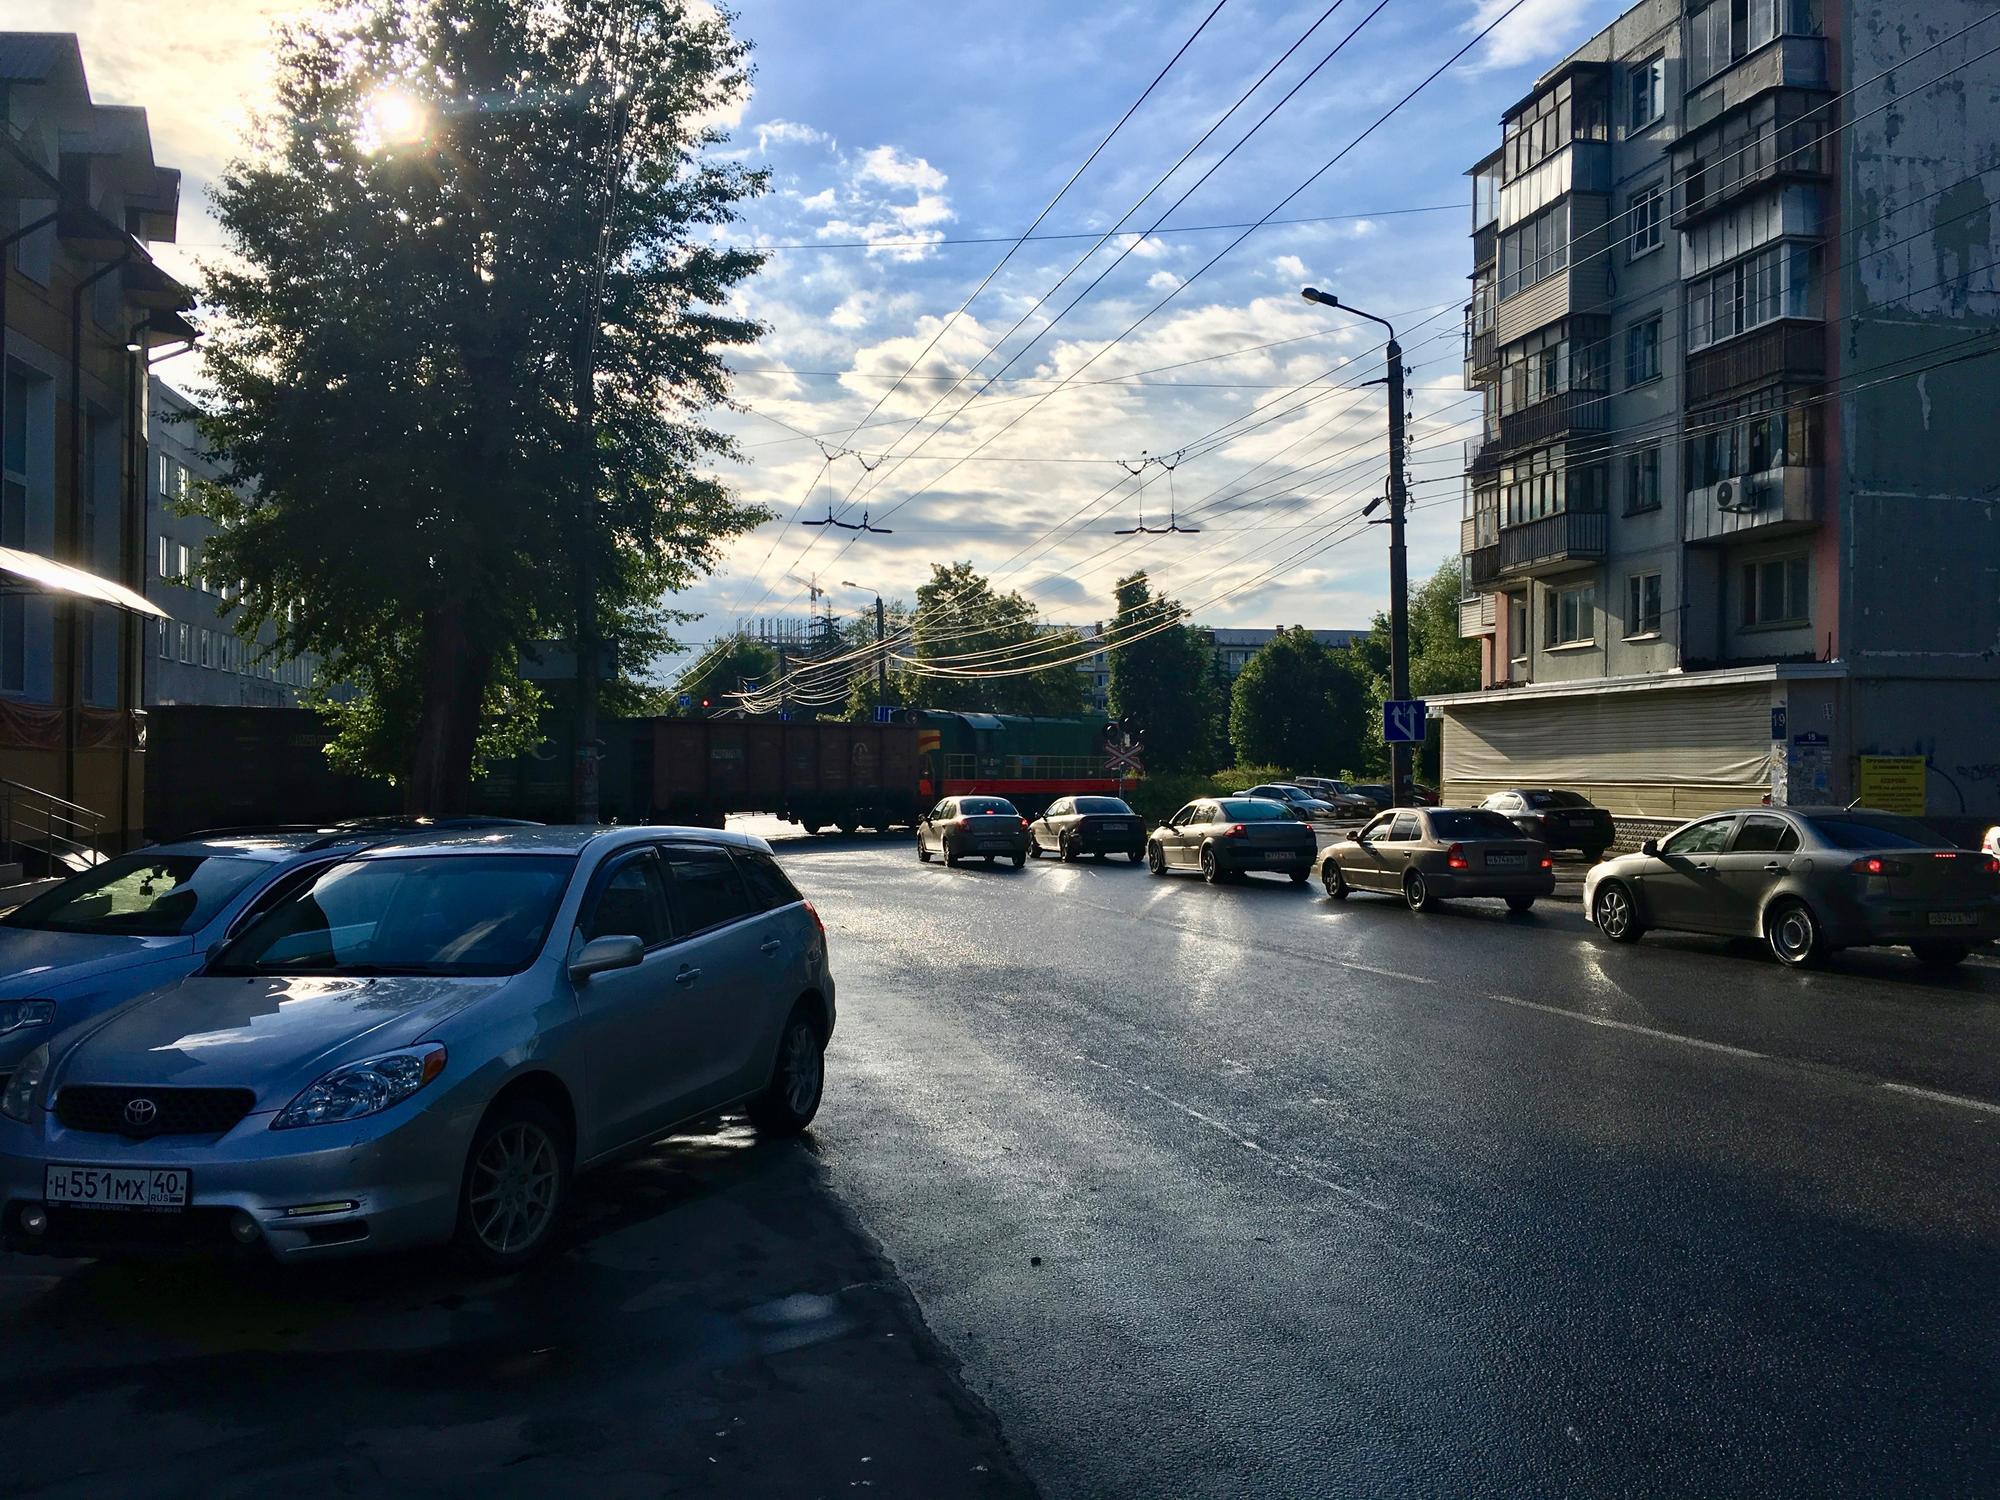 🇷🇺 Калуга, Россия, июнь 2017.